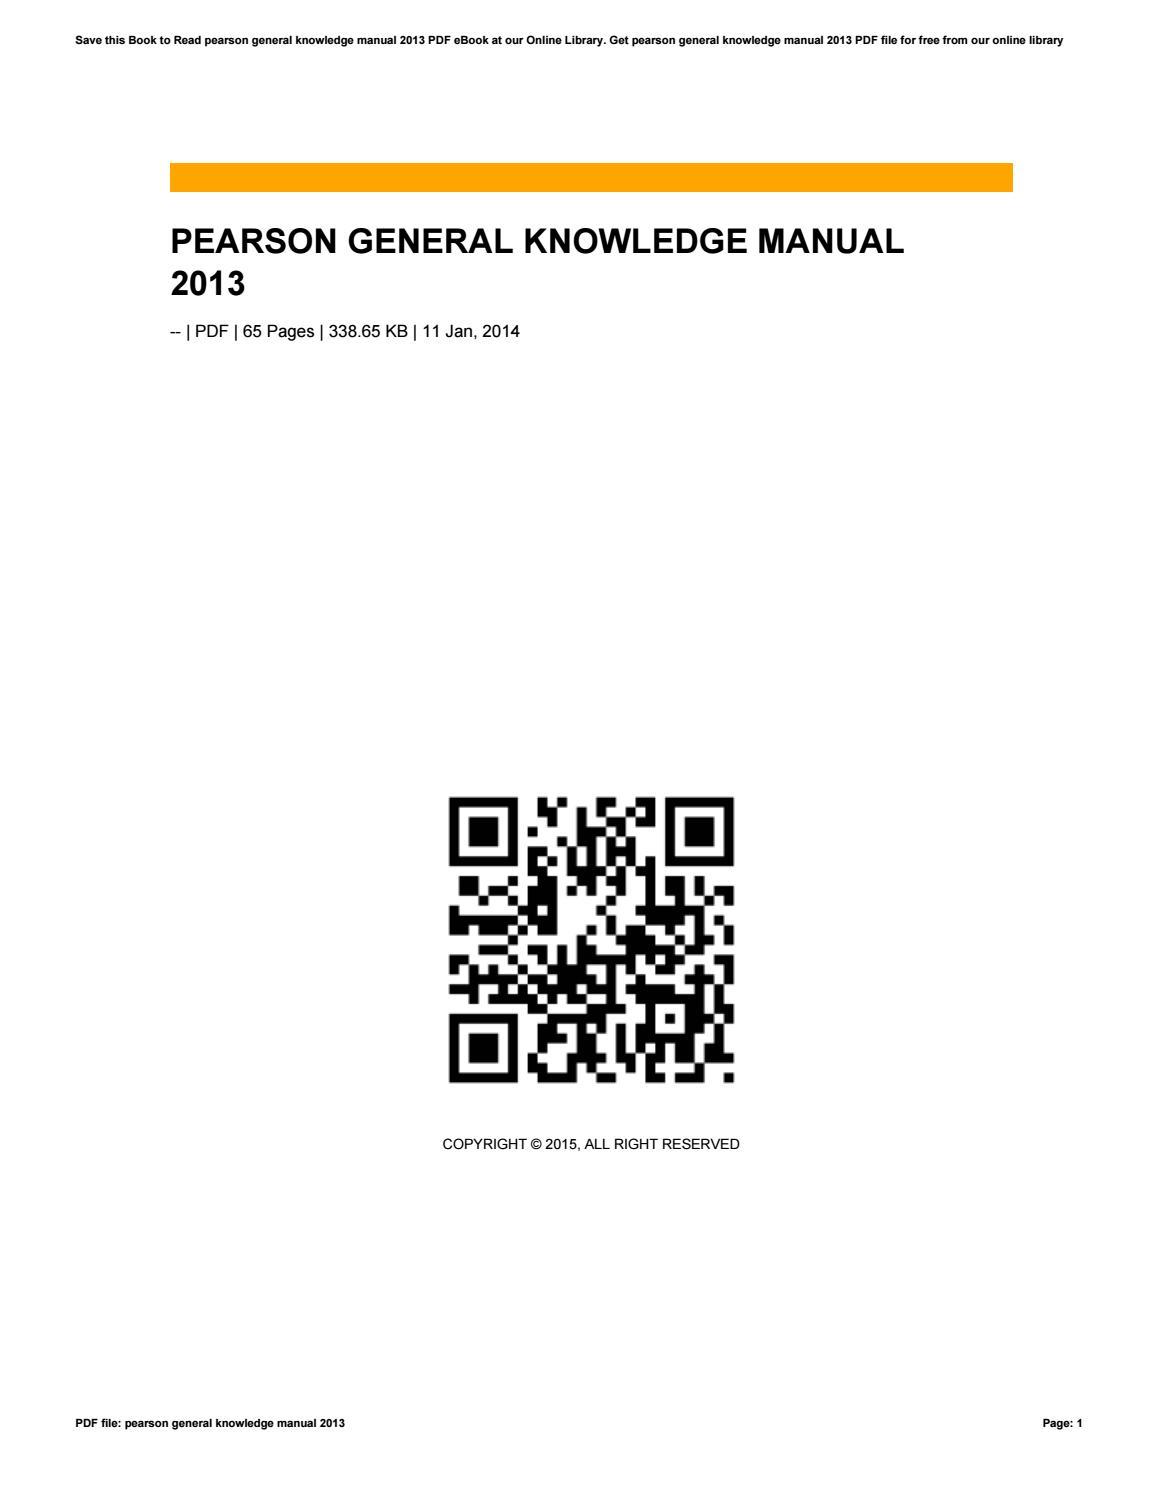 Pearson general knowledge manual 2013 by aditia26herman